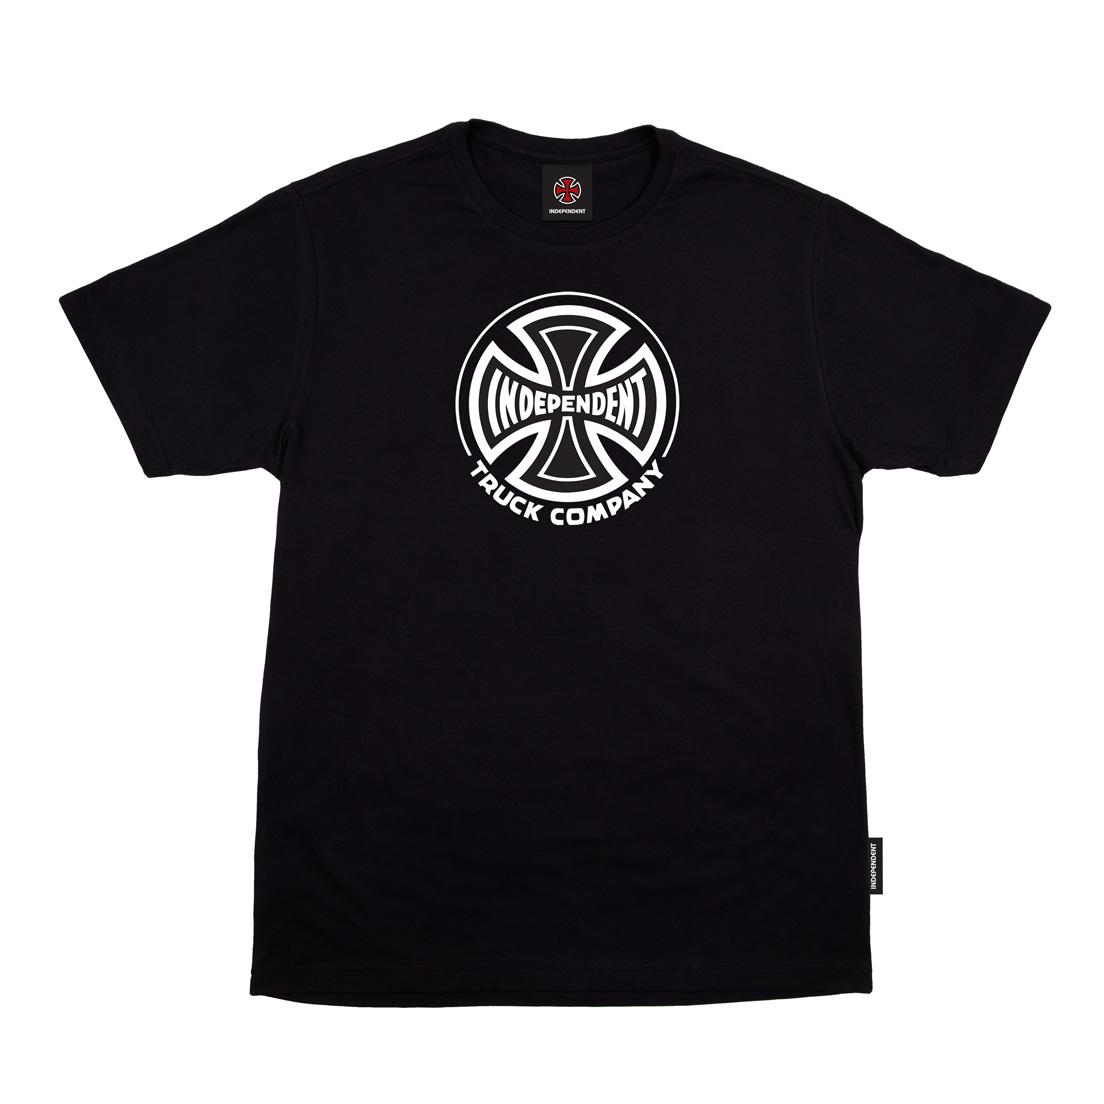 Camiseta Independent Truck Co. Black